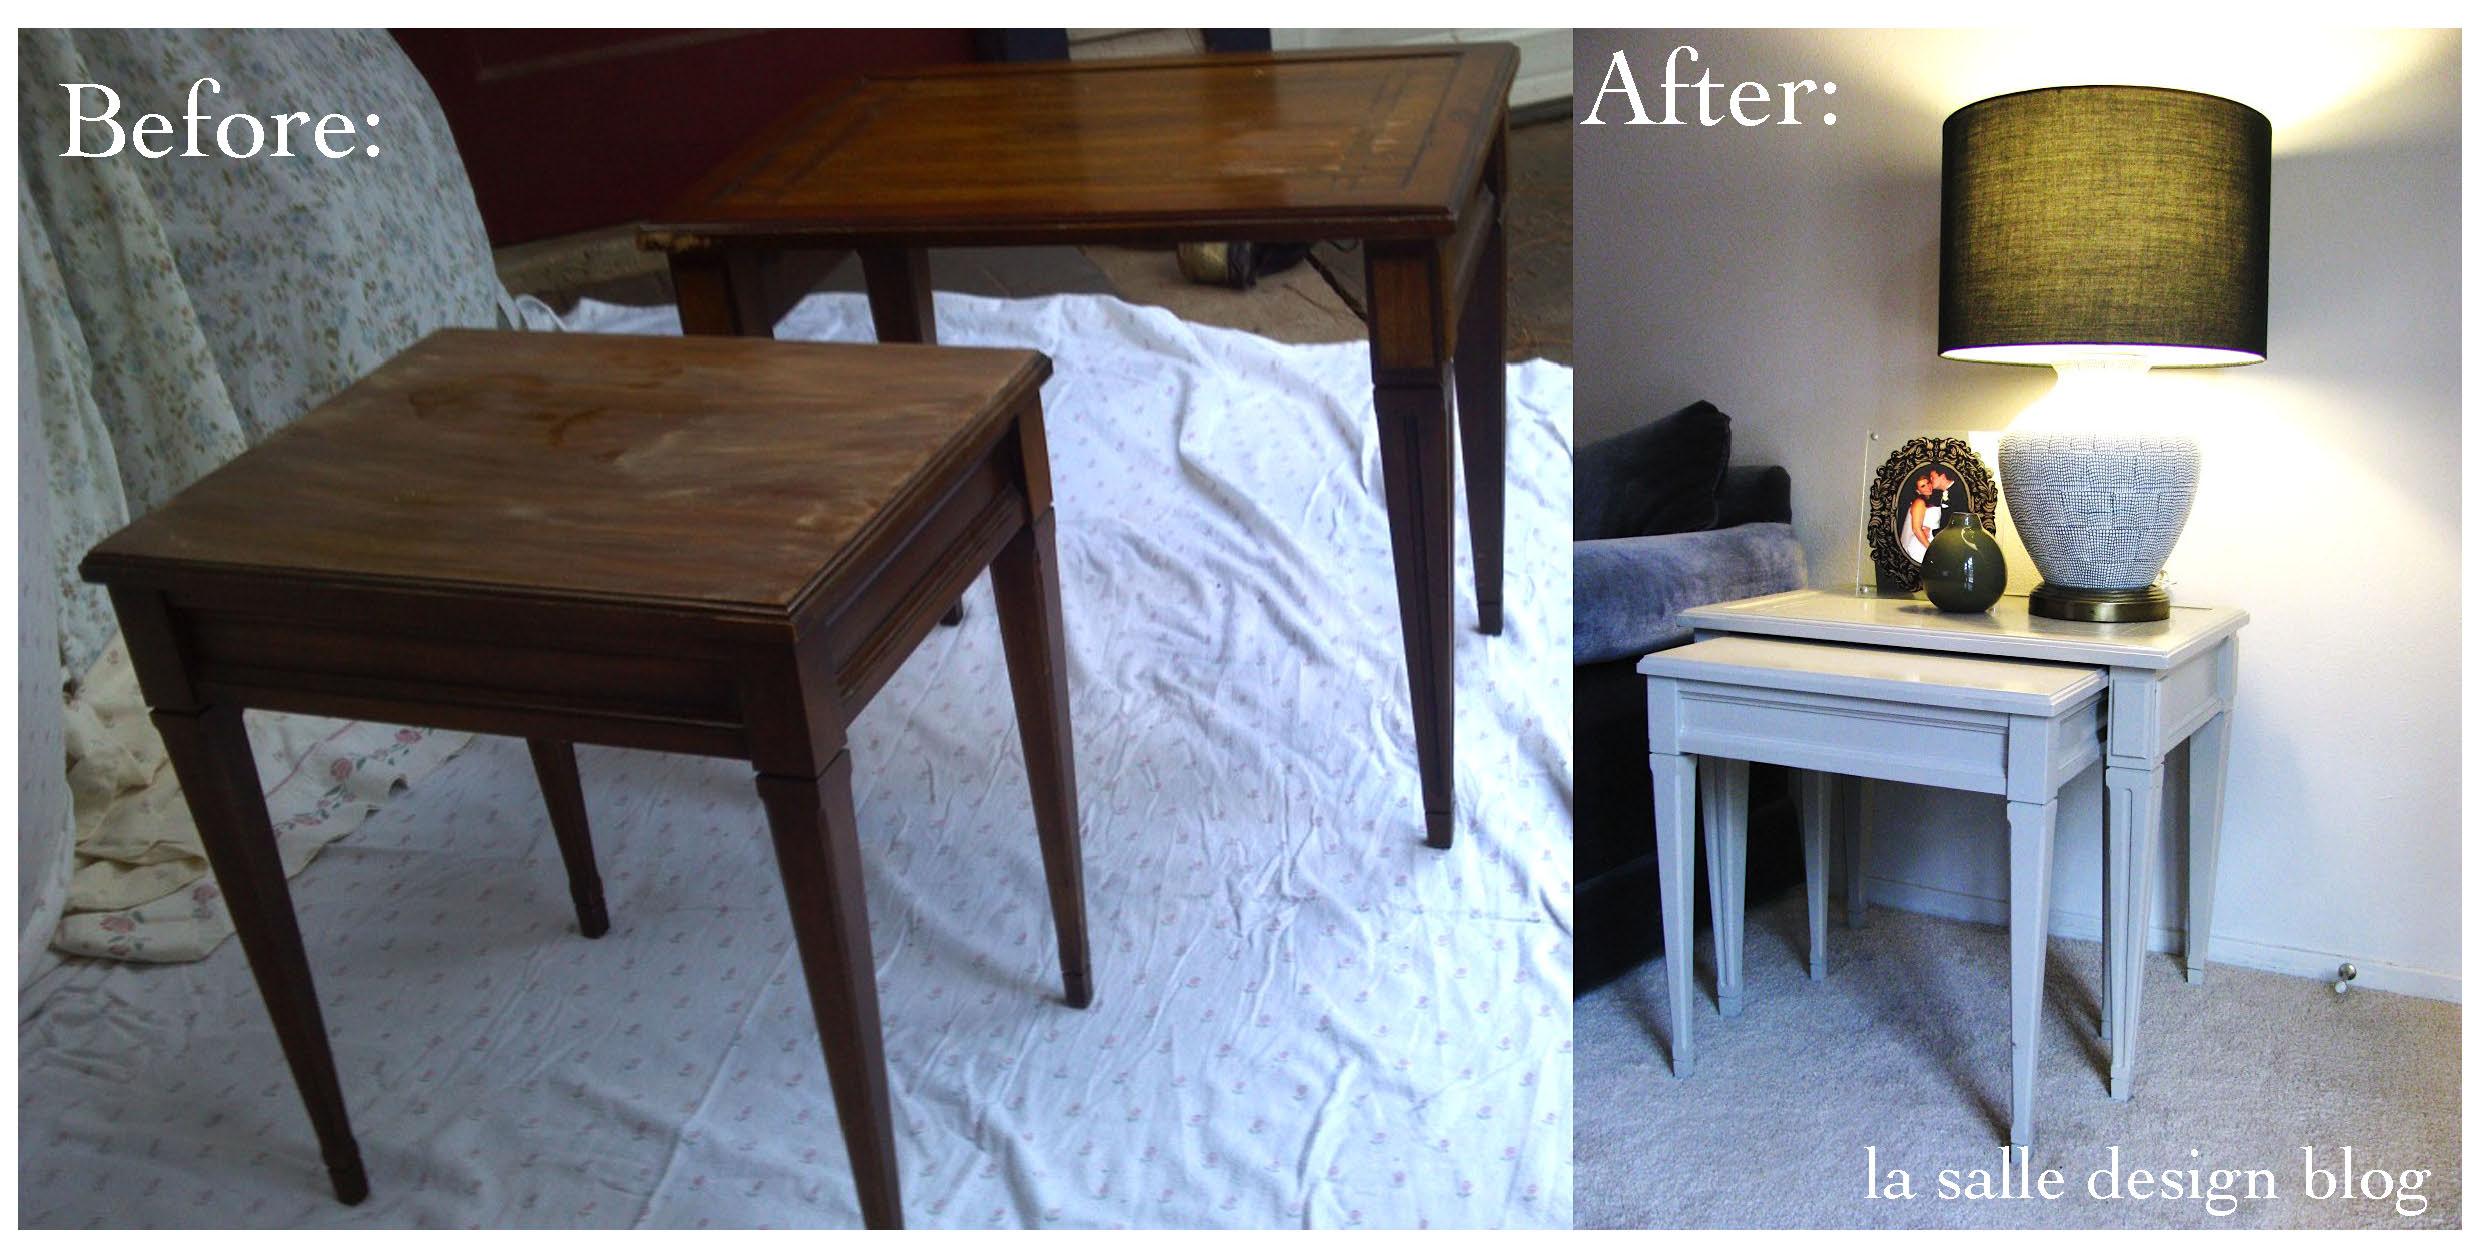 Wonderful image of Refinish: Nesting Tables la salle design blog with #3D5C8E color and 2486x1250 pixels